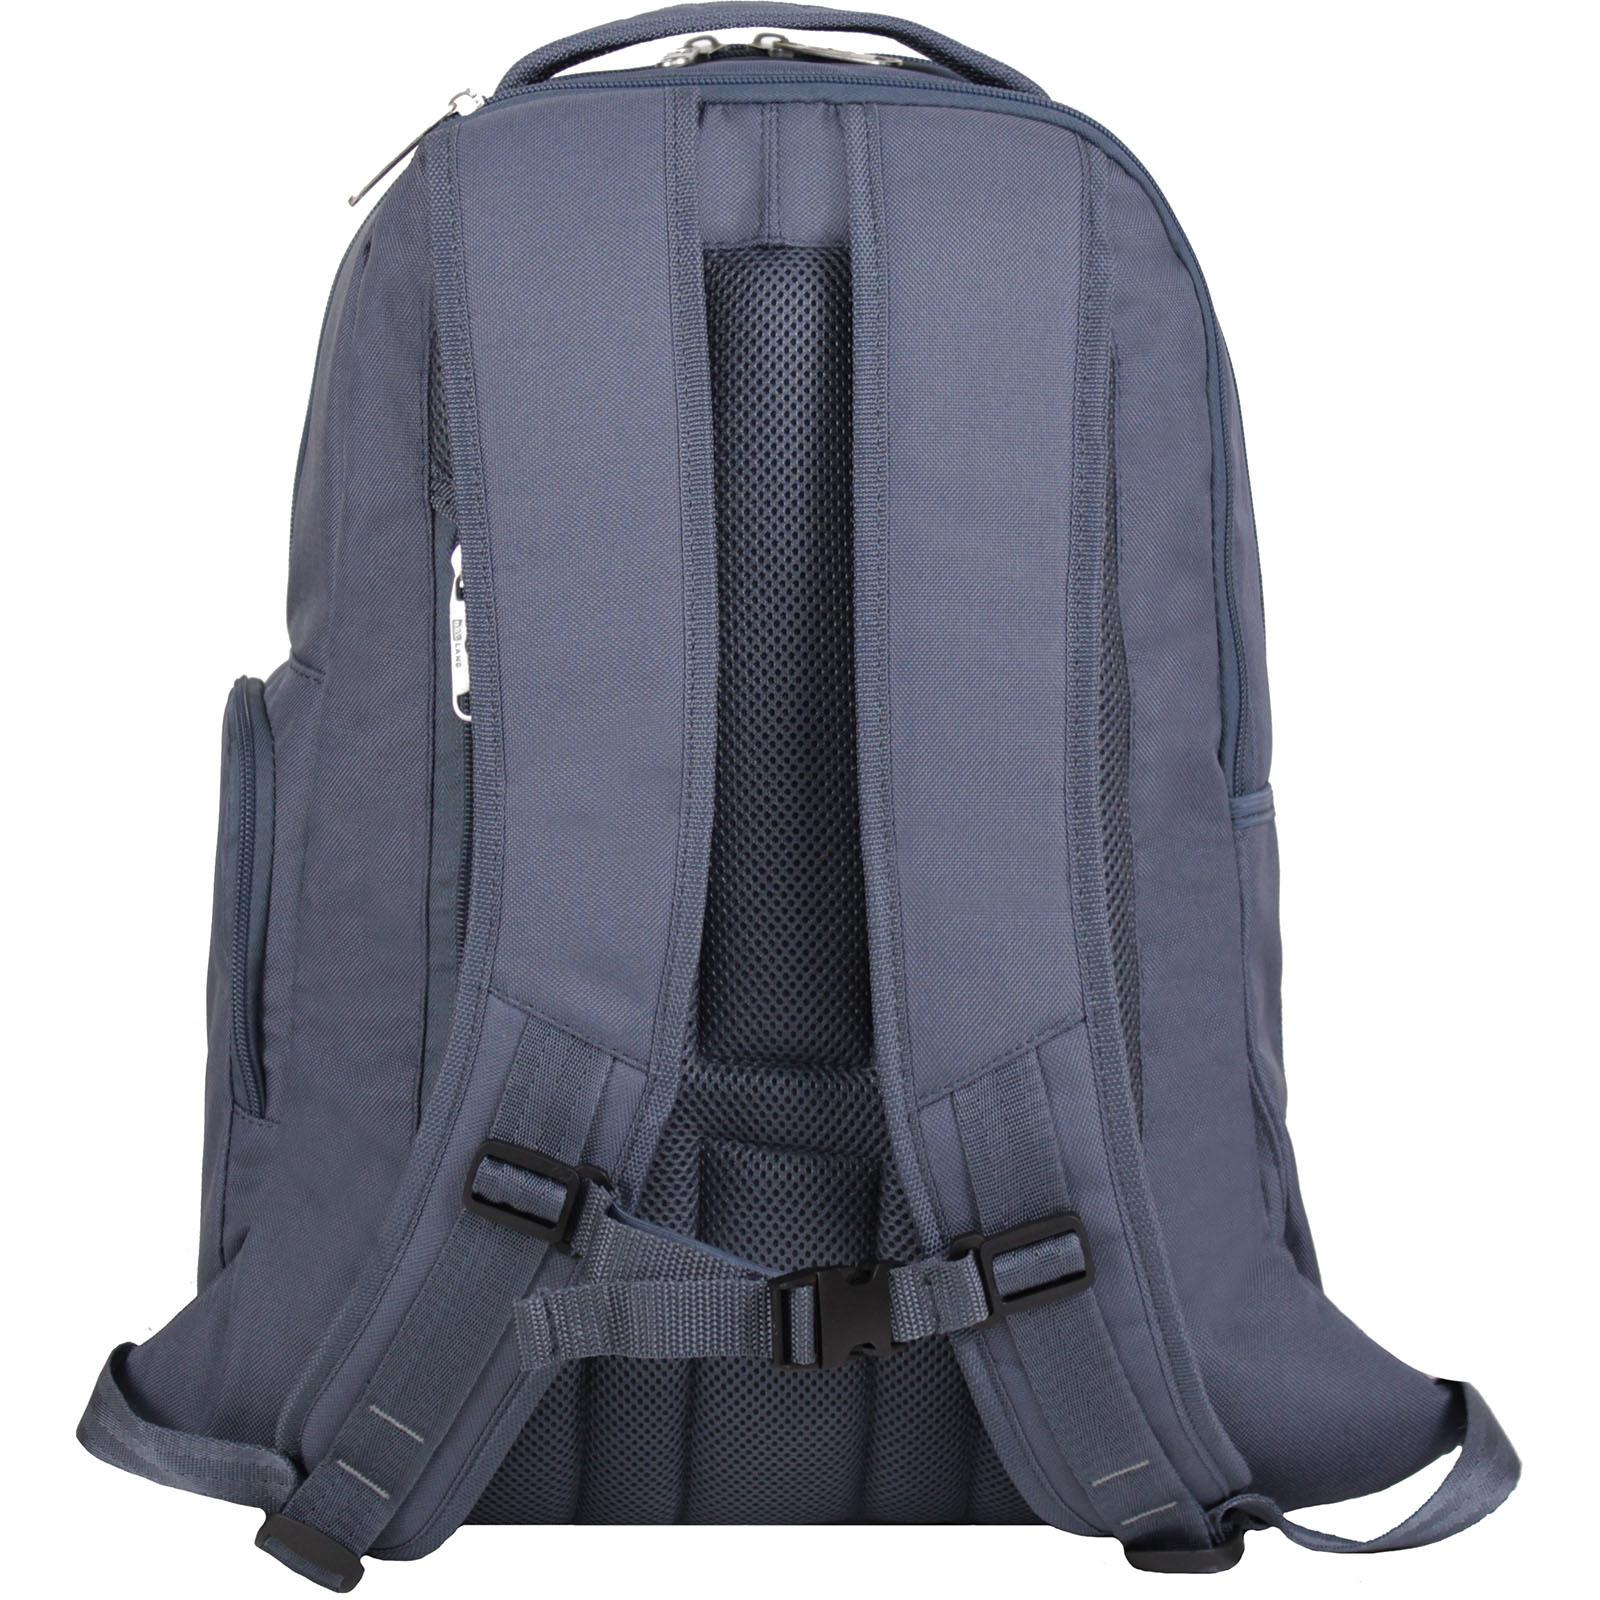 Рюкзак для ноутбука Bagland Техас 29 л. Темно серый (00532662)